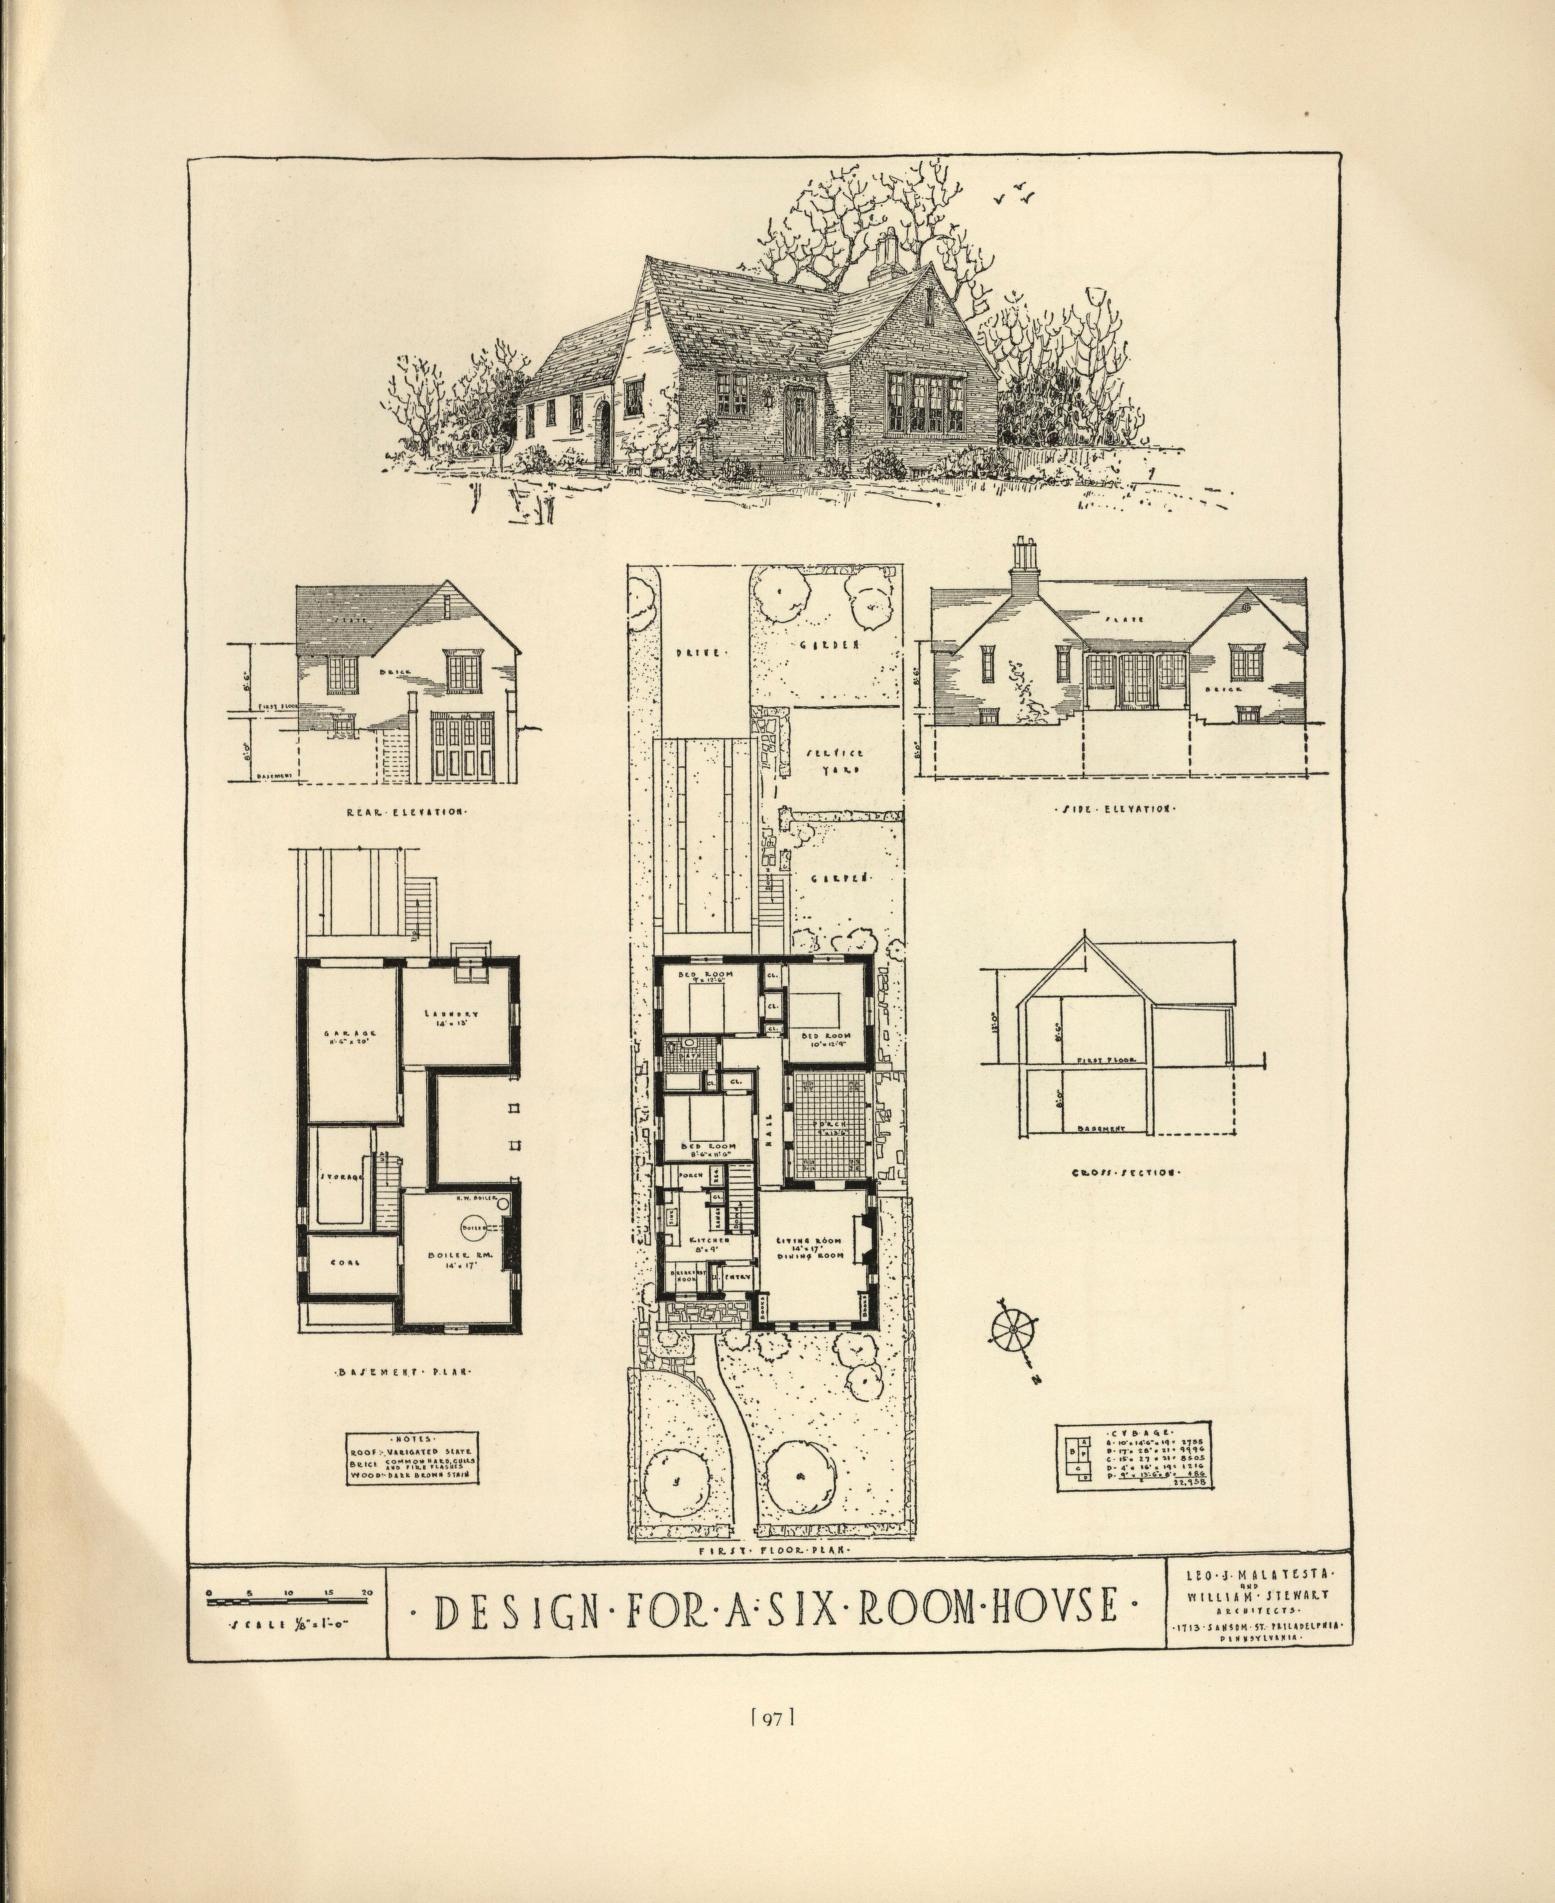 Chicago Tribune Book Of Homes Architectural Prints Vintage House Plans Chicago Tribune